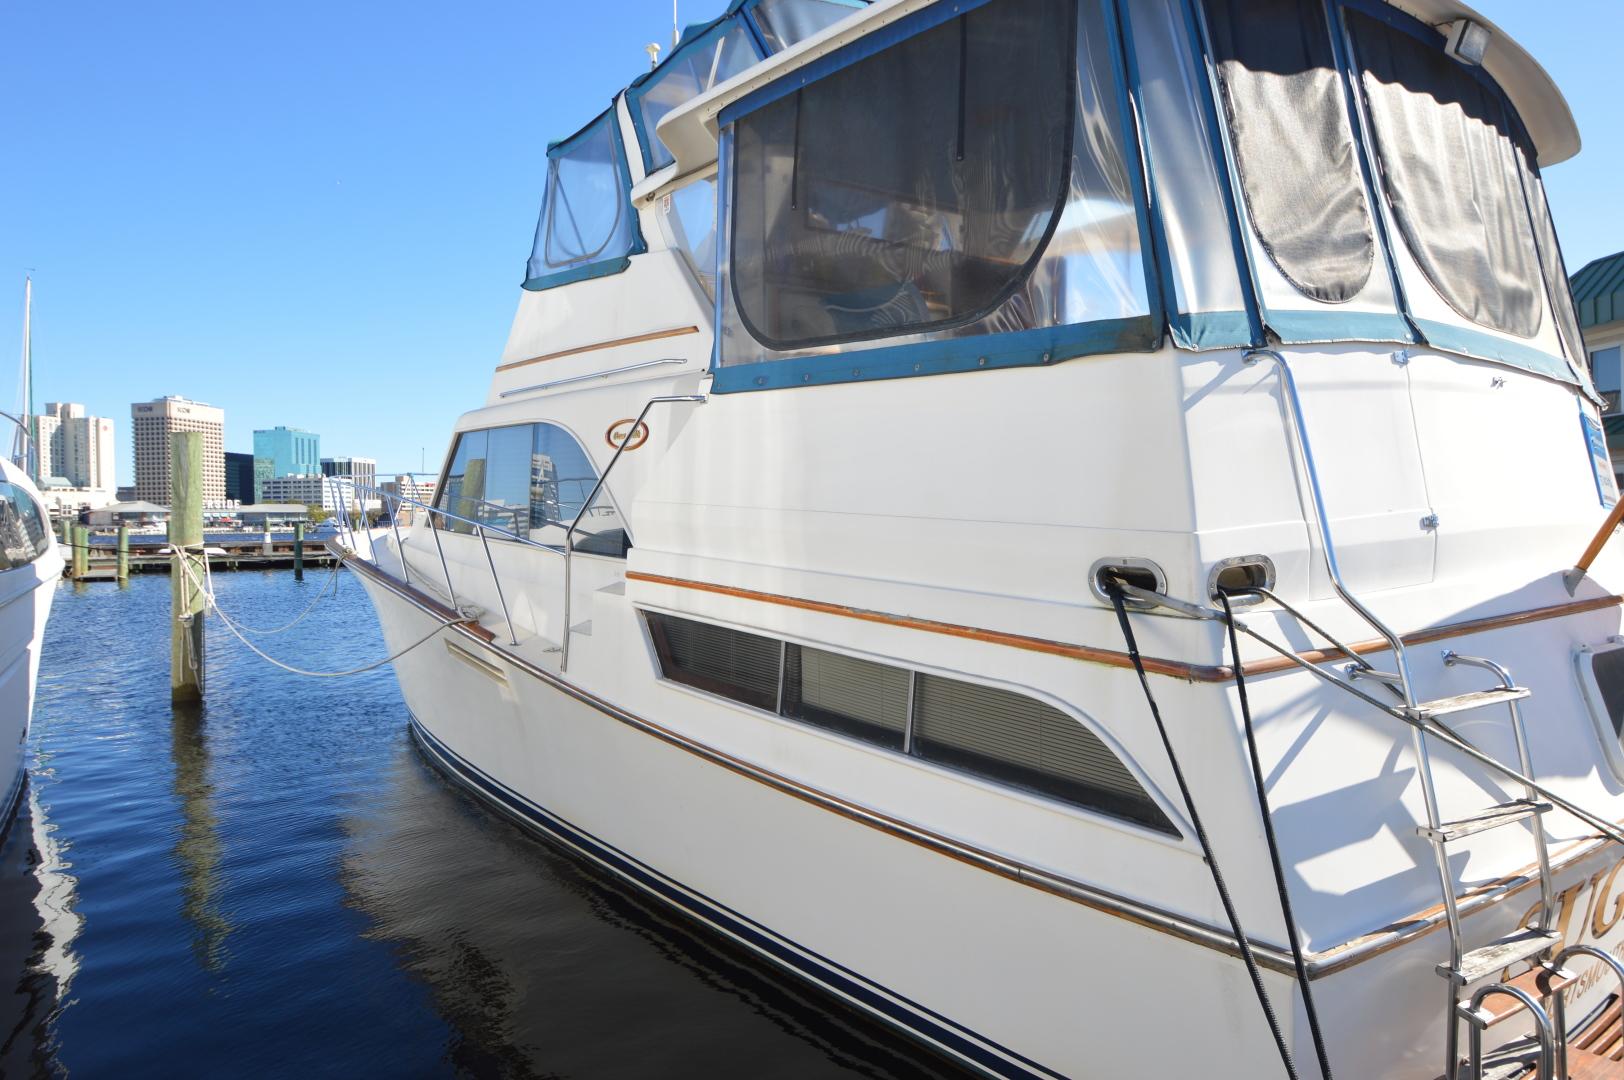 Ocean Yachts-46 Sunliner 1986-Sugah Portsmouth-Virginia-United States-1555480 | Thumbnail